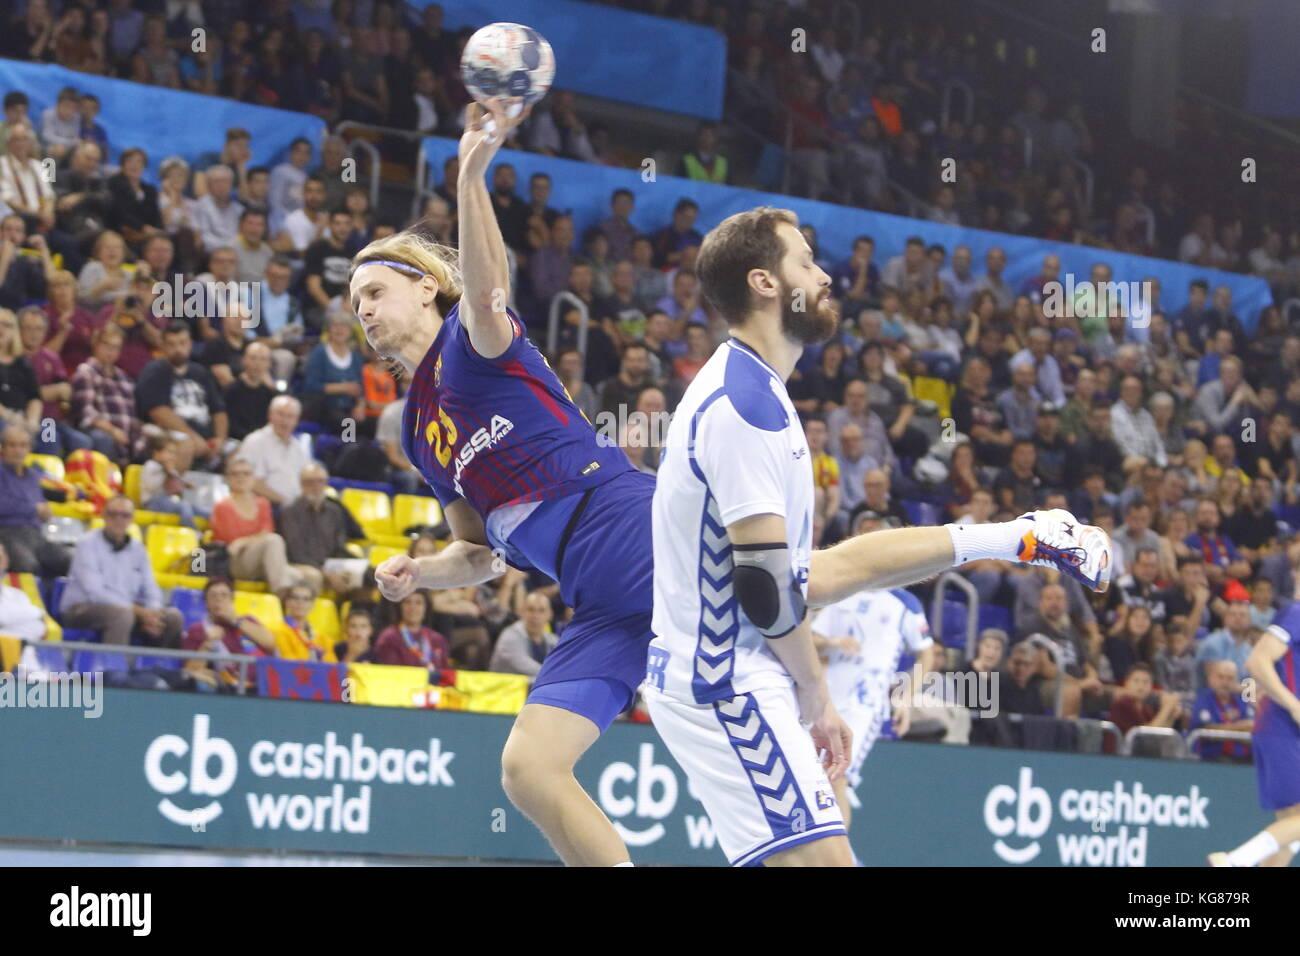 Jure Dolenec,4th October  2017, Palau Blaugrana, Barcelona, Spain; EHF Mens Champions League Group Phase, handball. - Stock Image